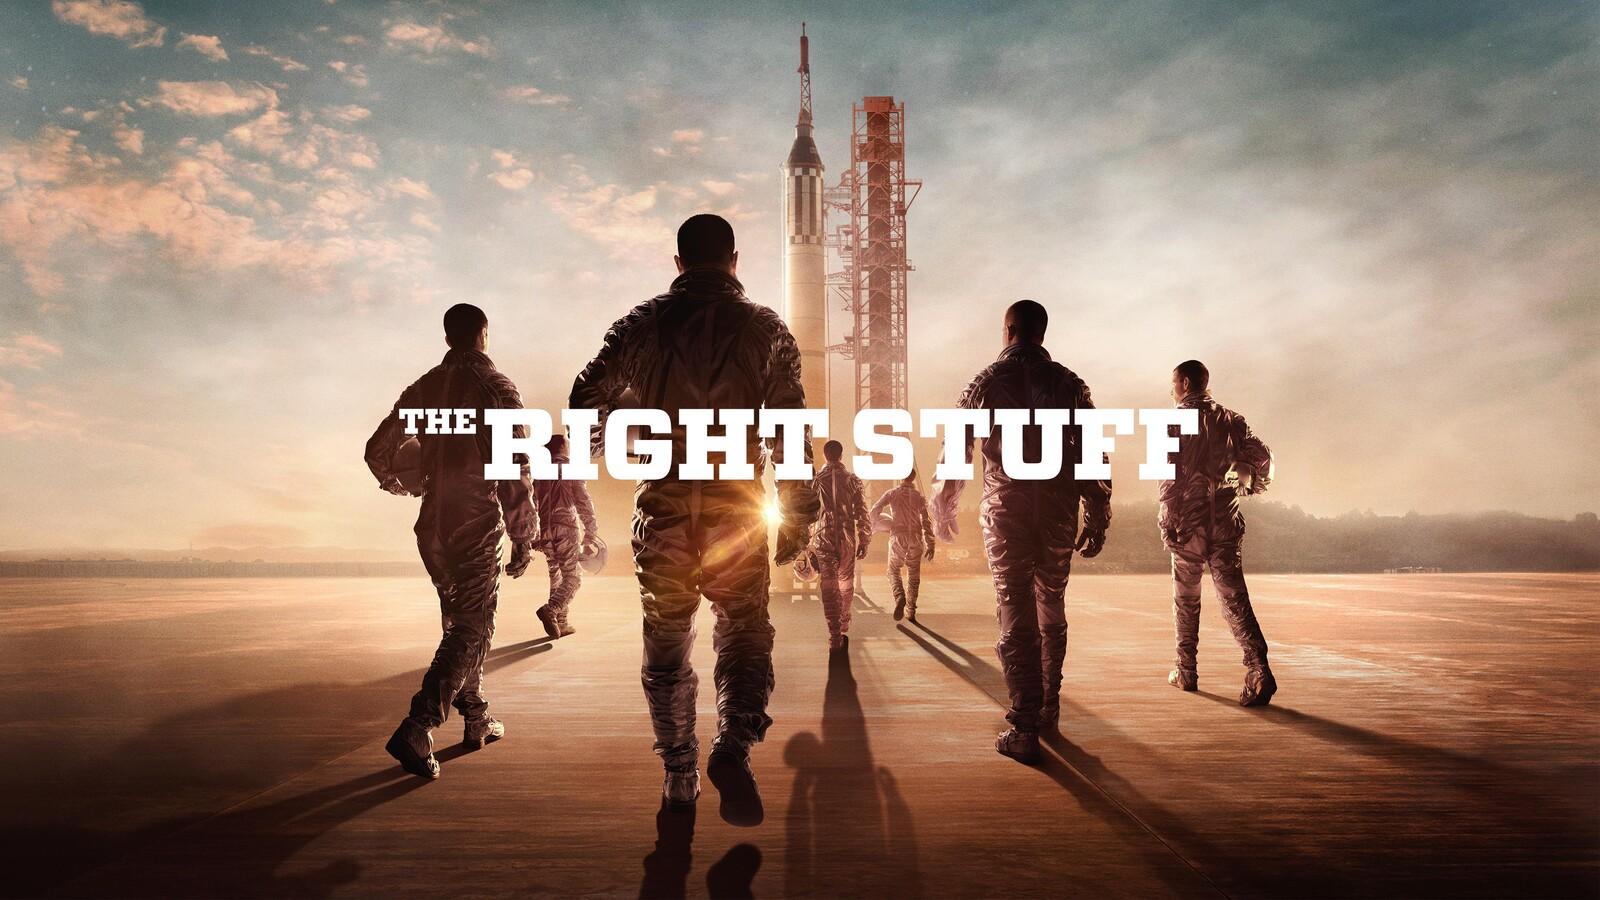 The Right Stuff (1983) – Adventure, Biography, Drama